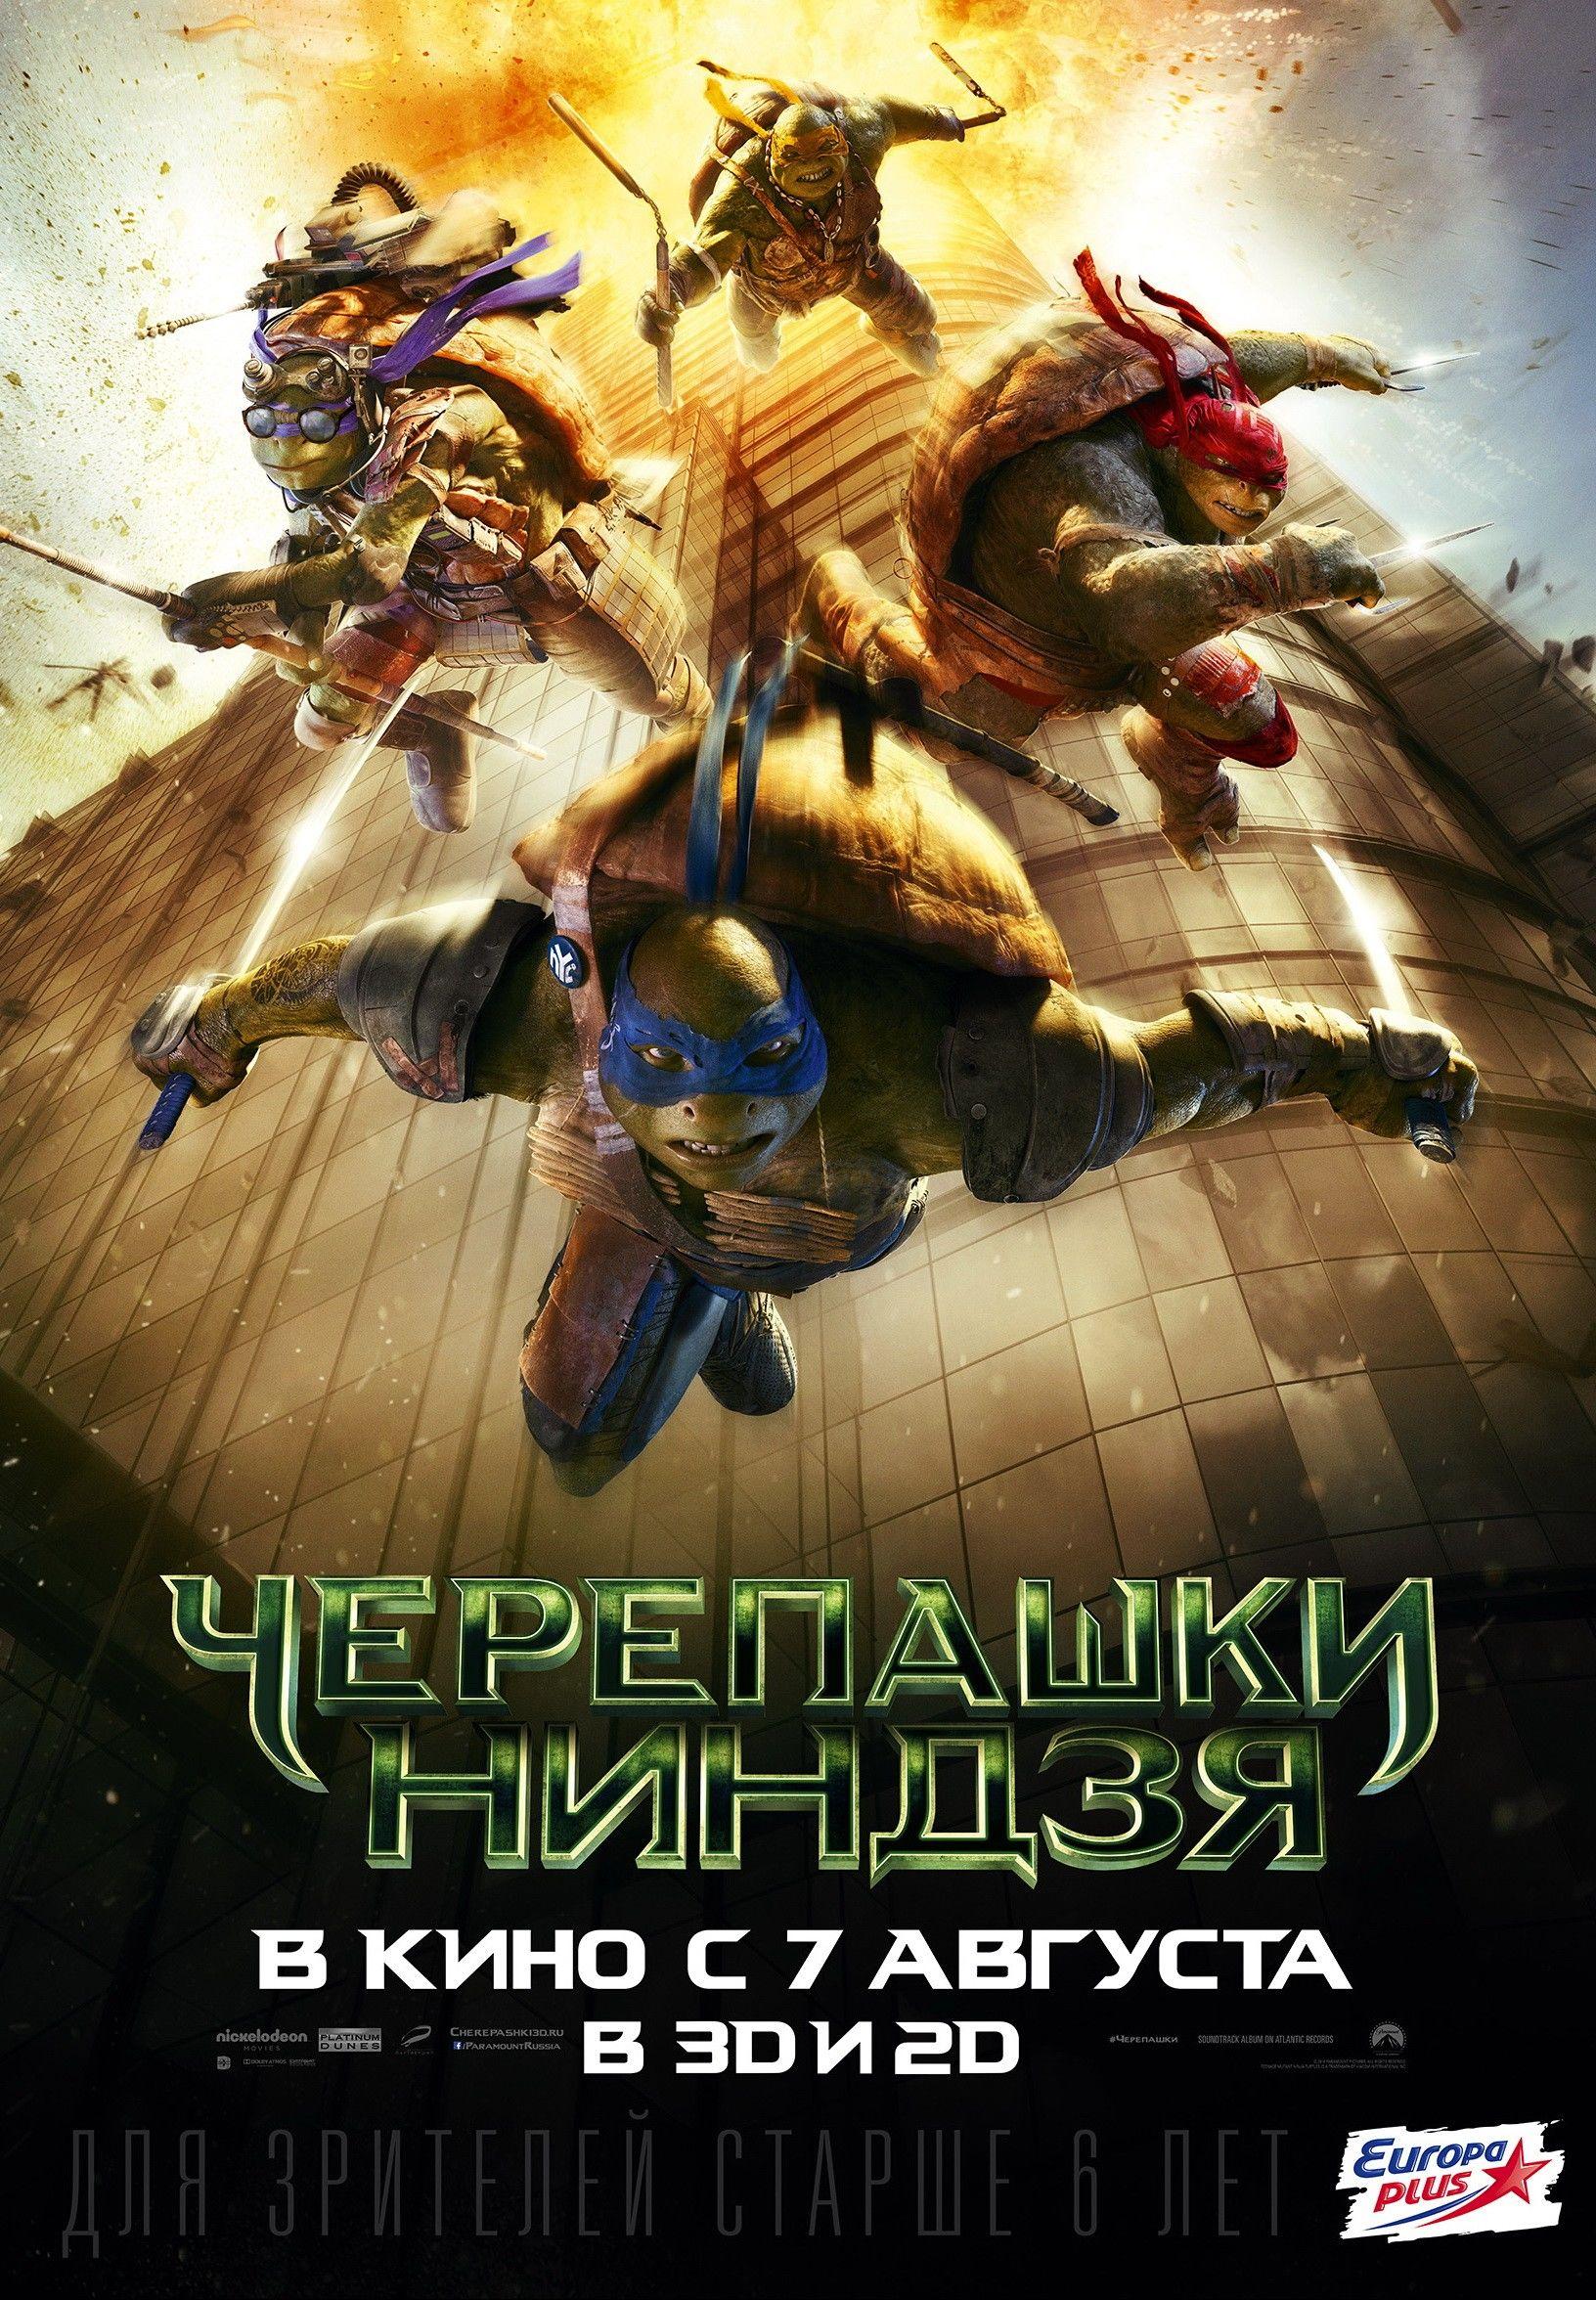 Черепашкининдзя 2 2016 в HD 1080 смотреть онлайн